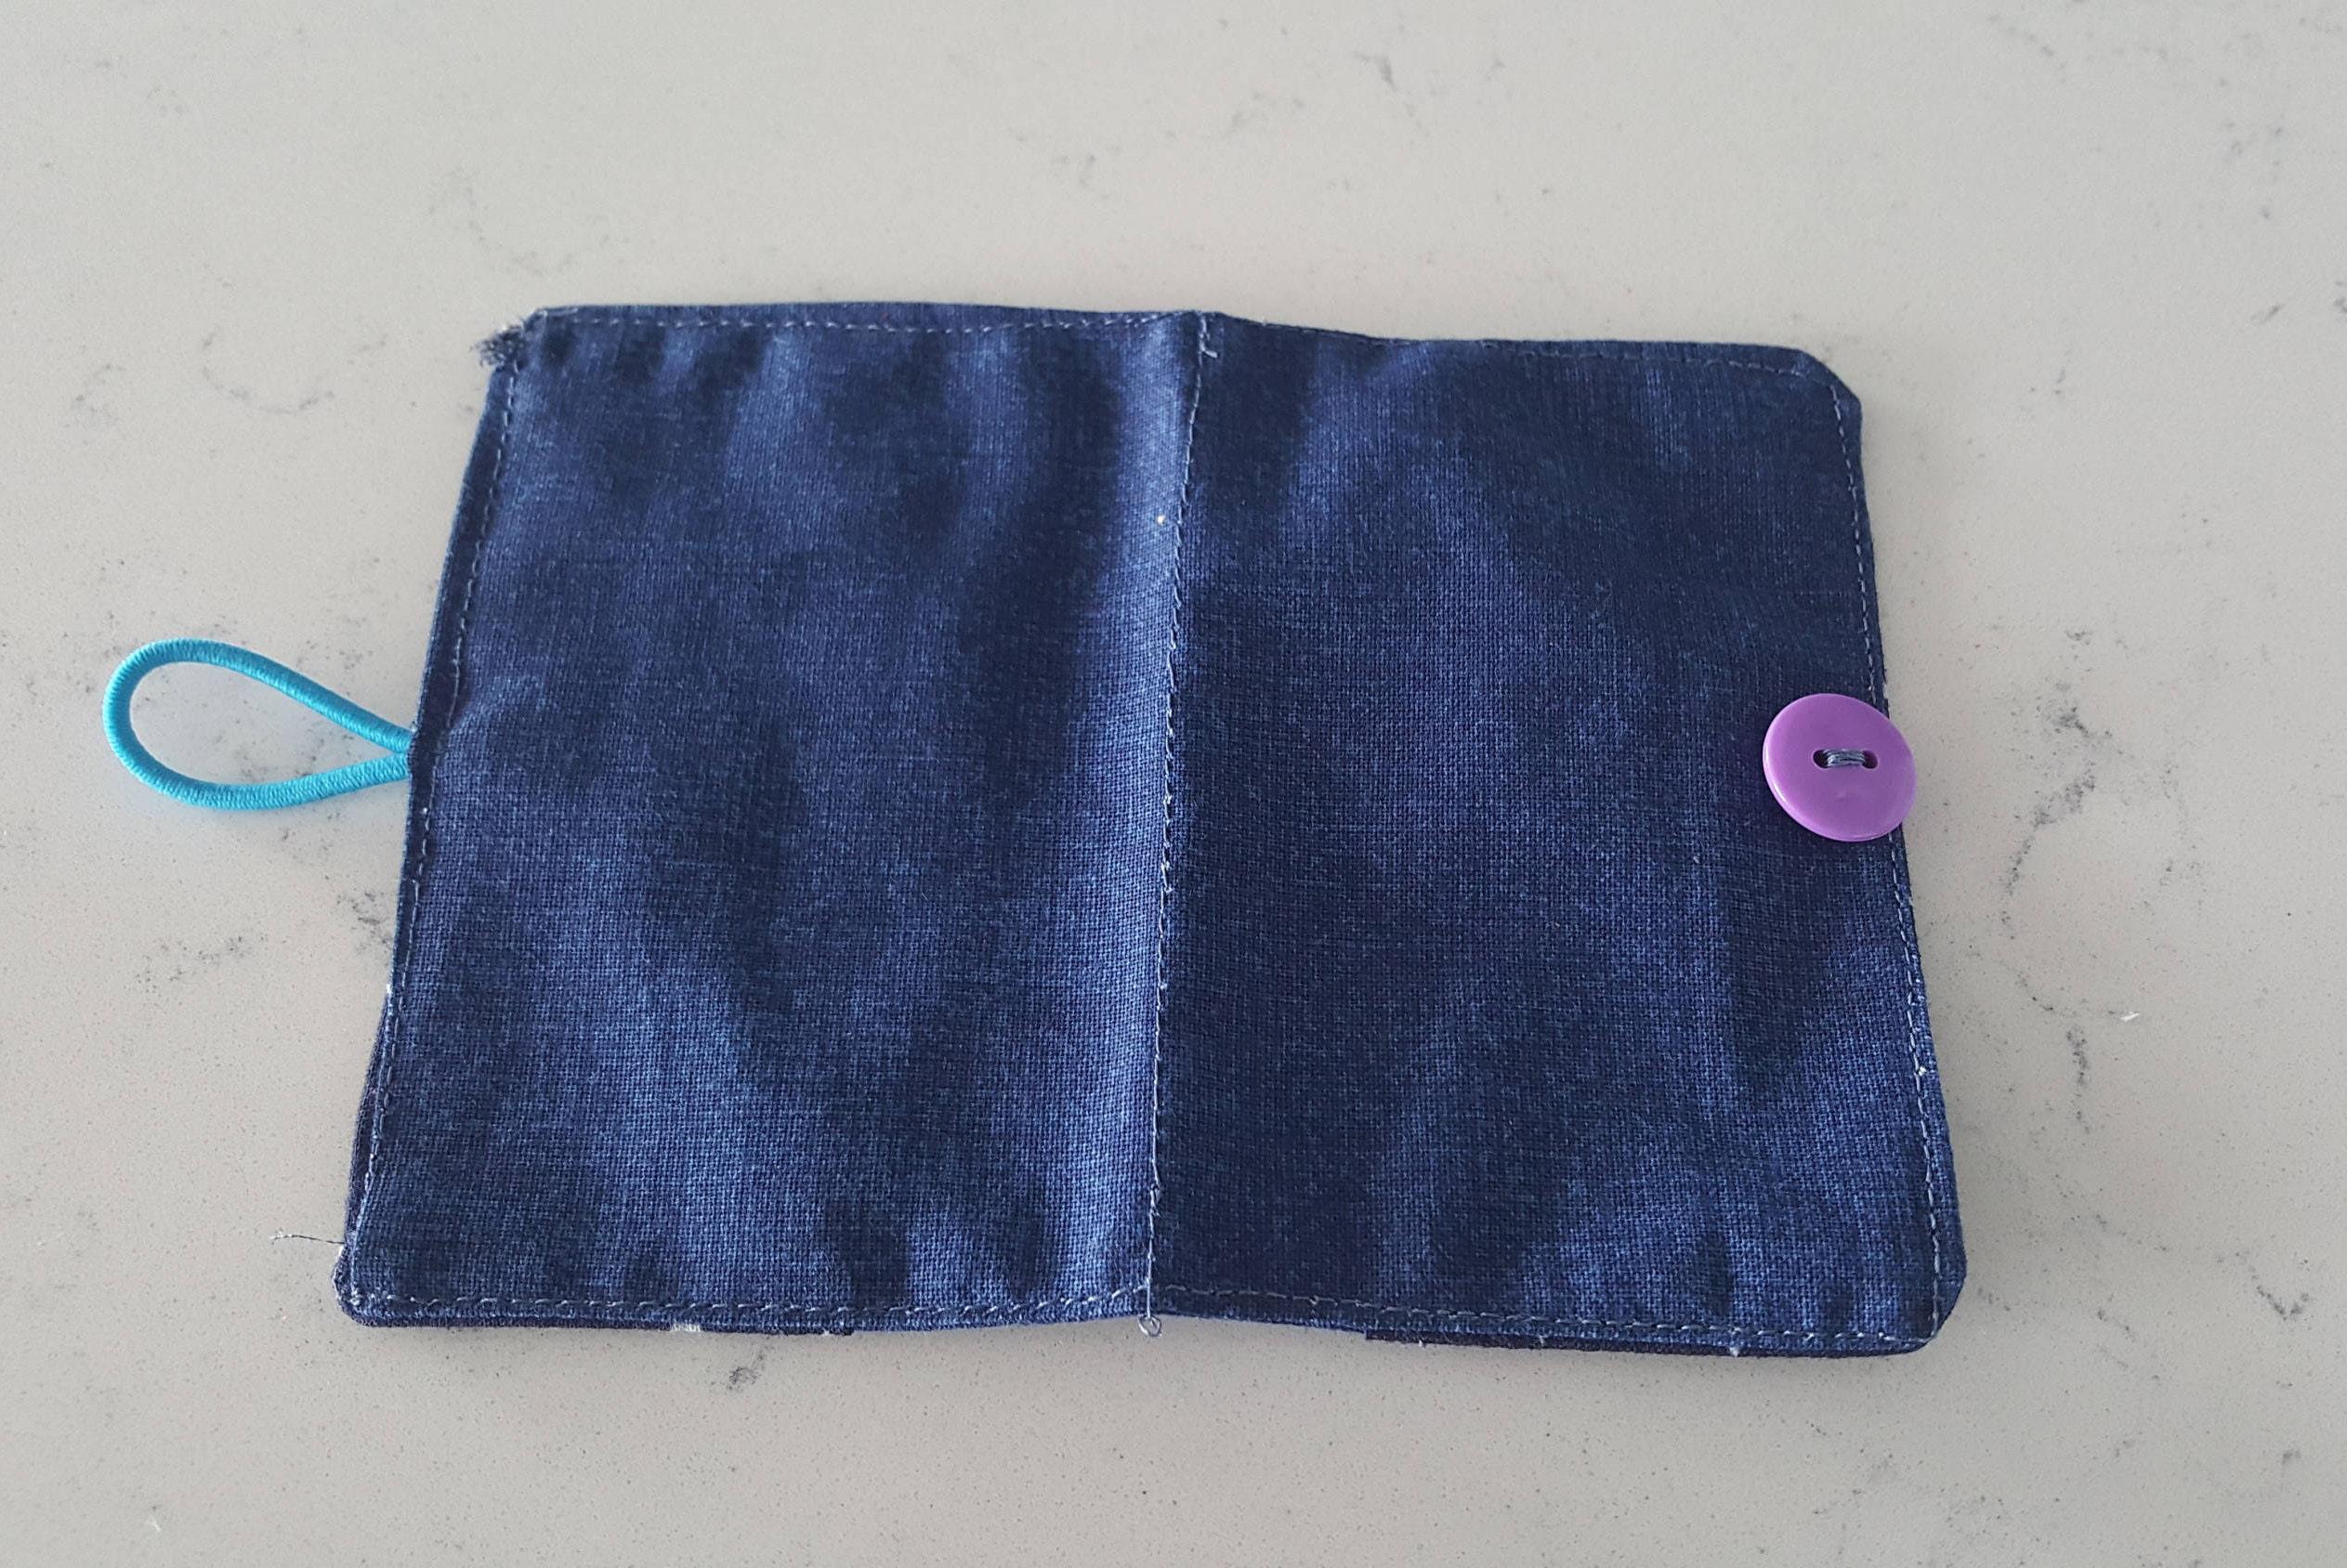 Blue Business Card/ Money Card Holder [E10251039381440773M] - $15.00 ...